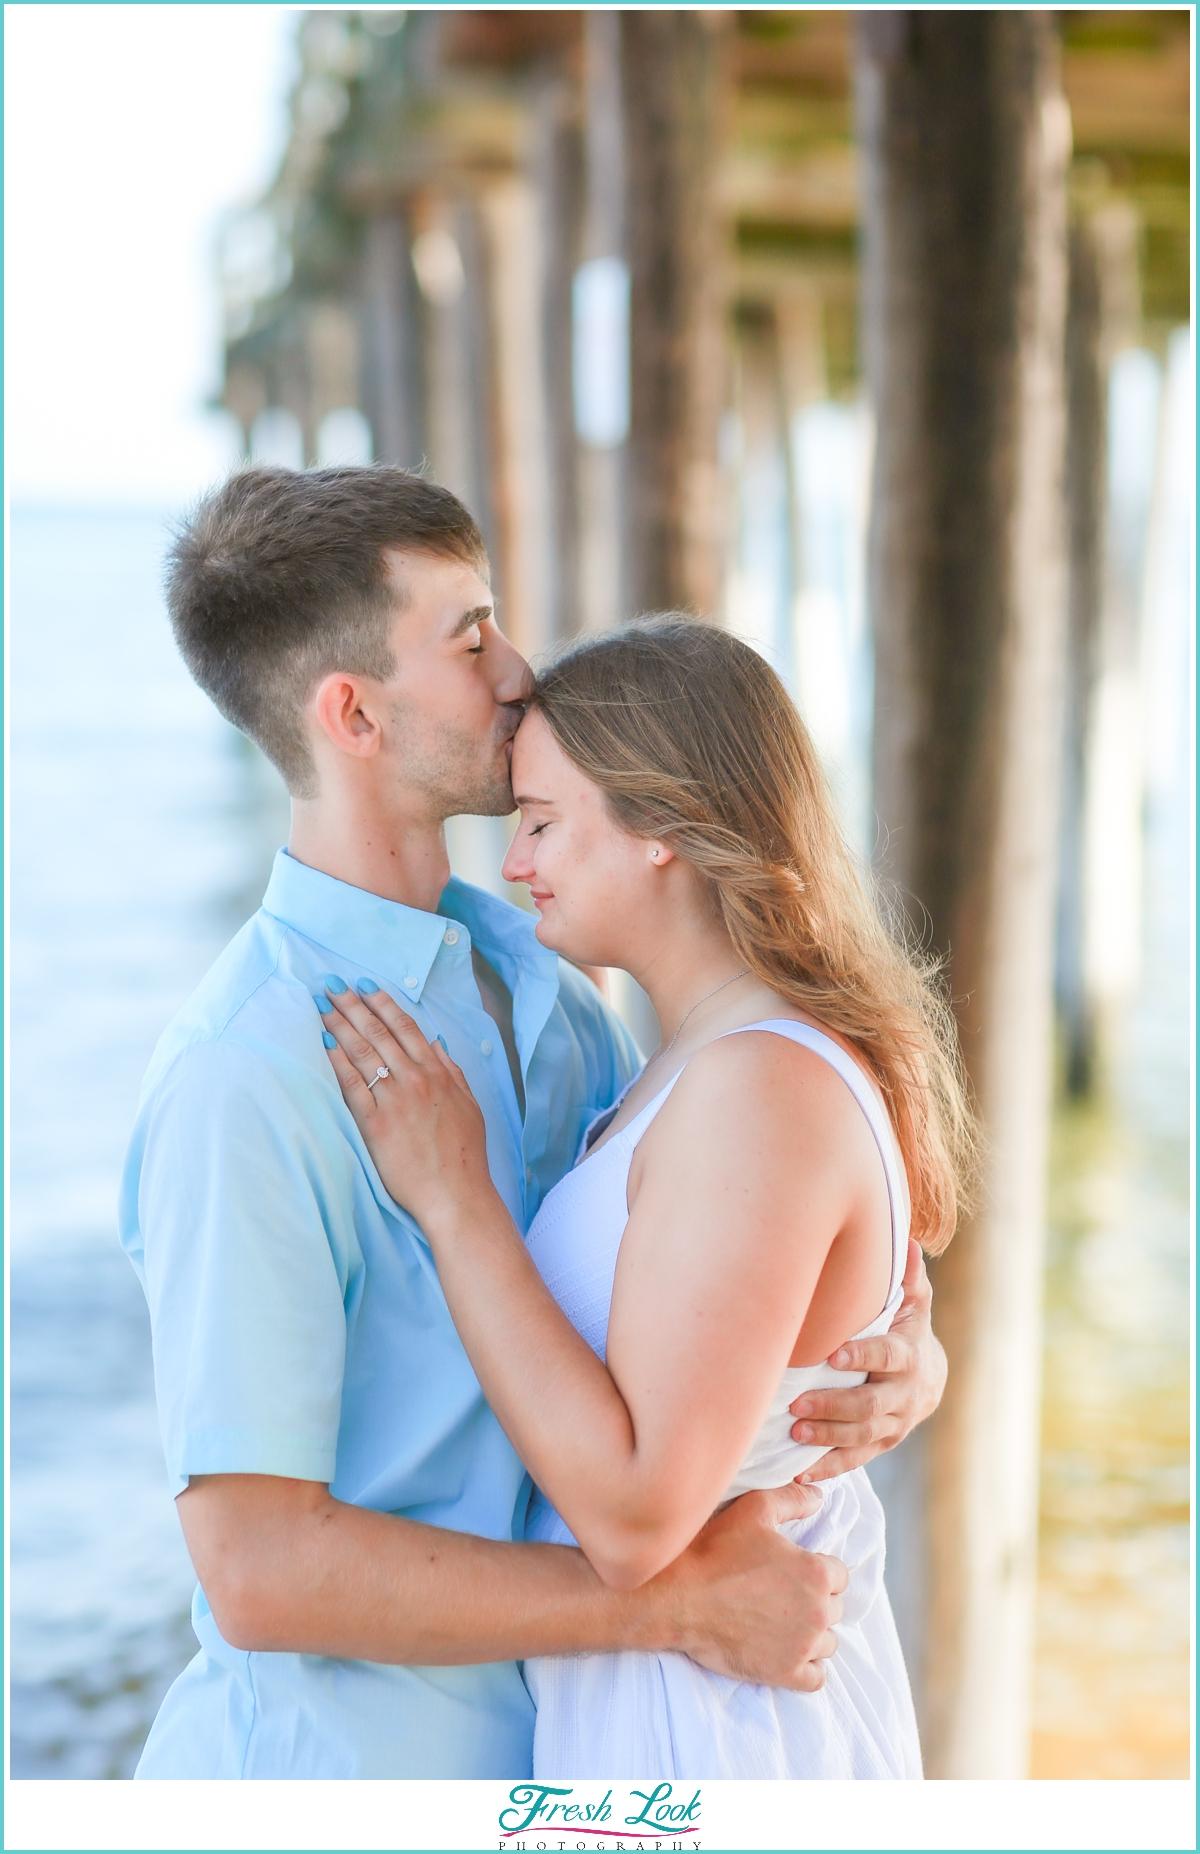 romantic engagement photoshoot on the beach